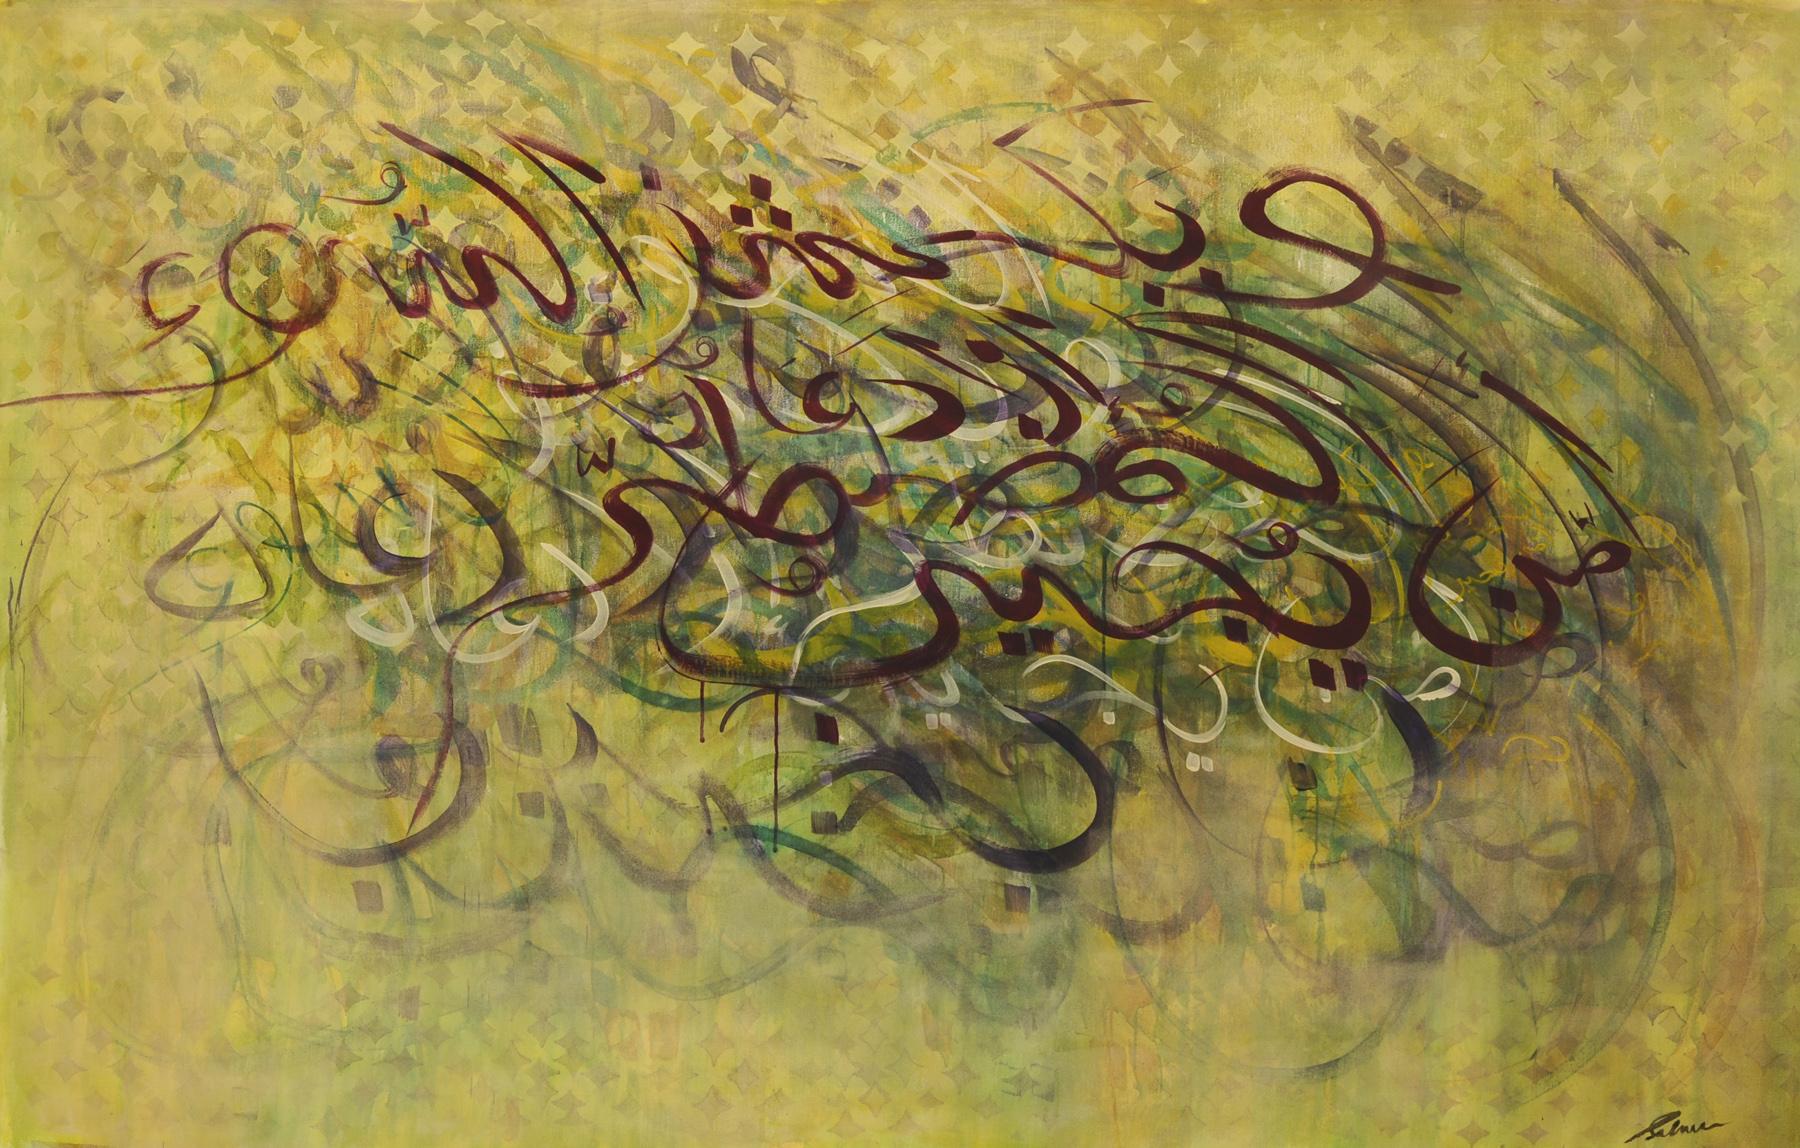 MOCRA_Salma Arastu - Healing prayer 6x4 x 300pxi.jpg